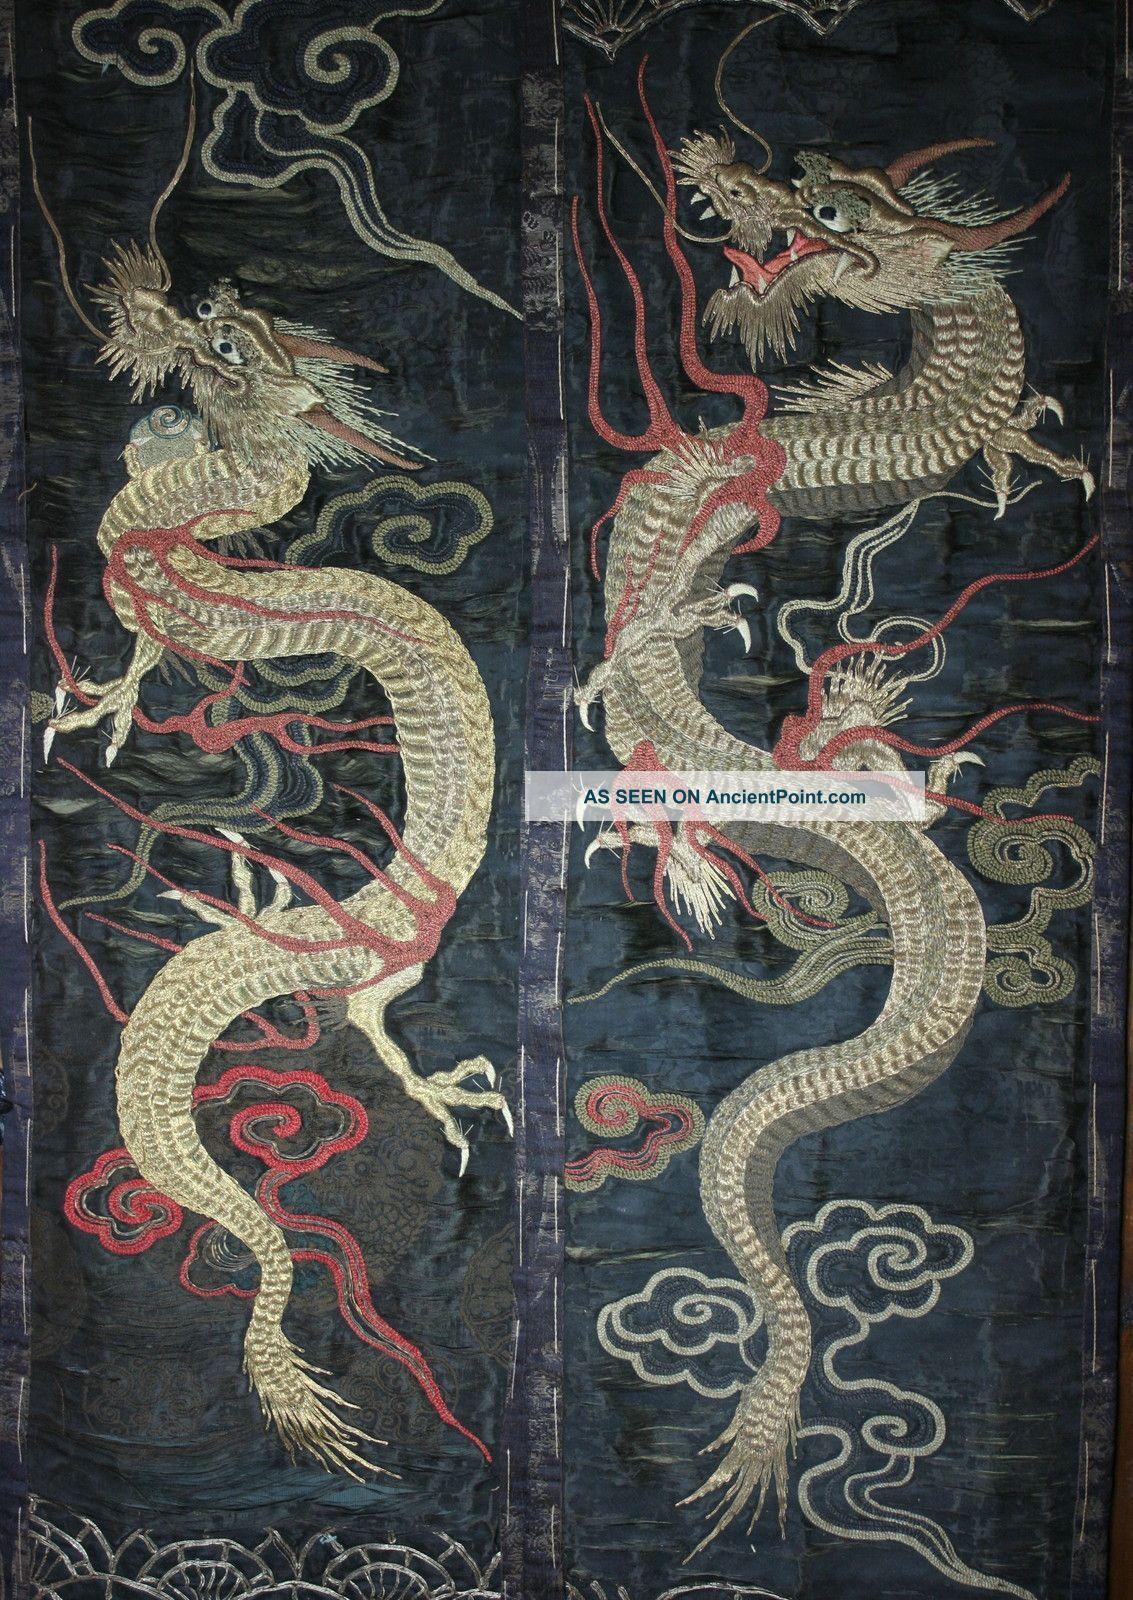 Pair Antique Japanese Embroidered Silk Dragon Hangings Reworking Kimonos & Textiles